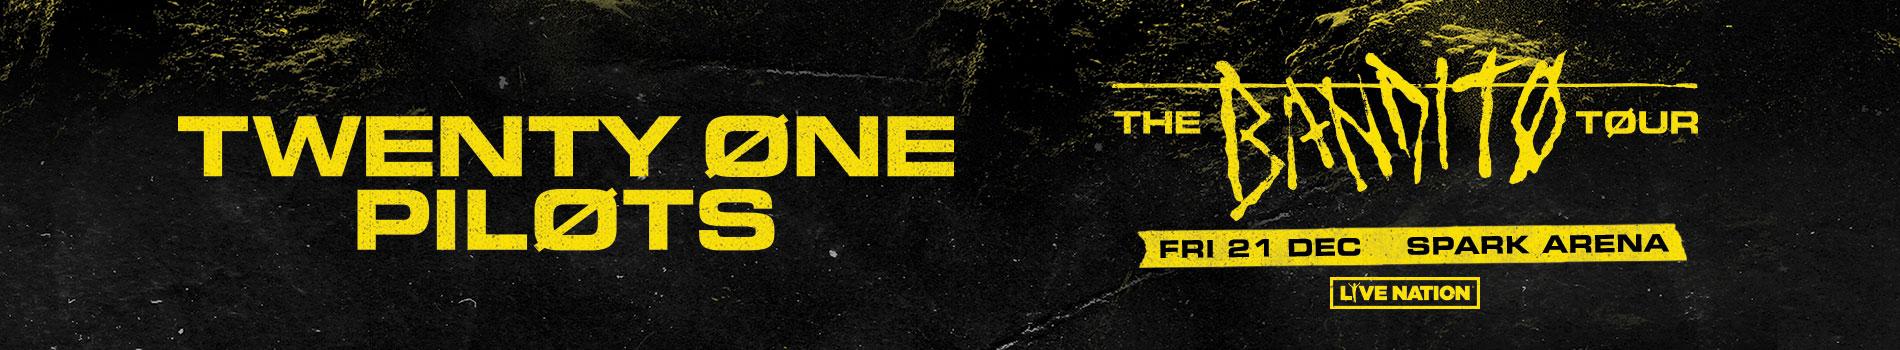 TØP Tour - Masthead Banner